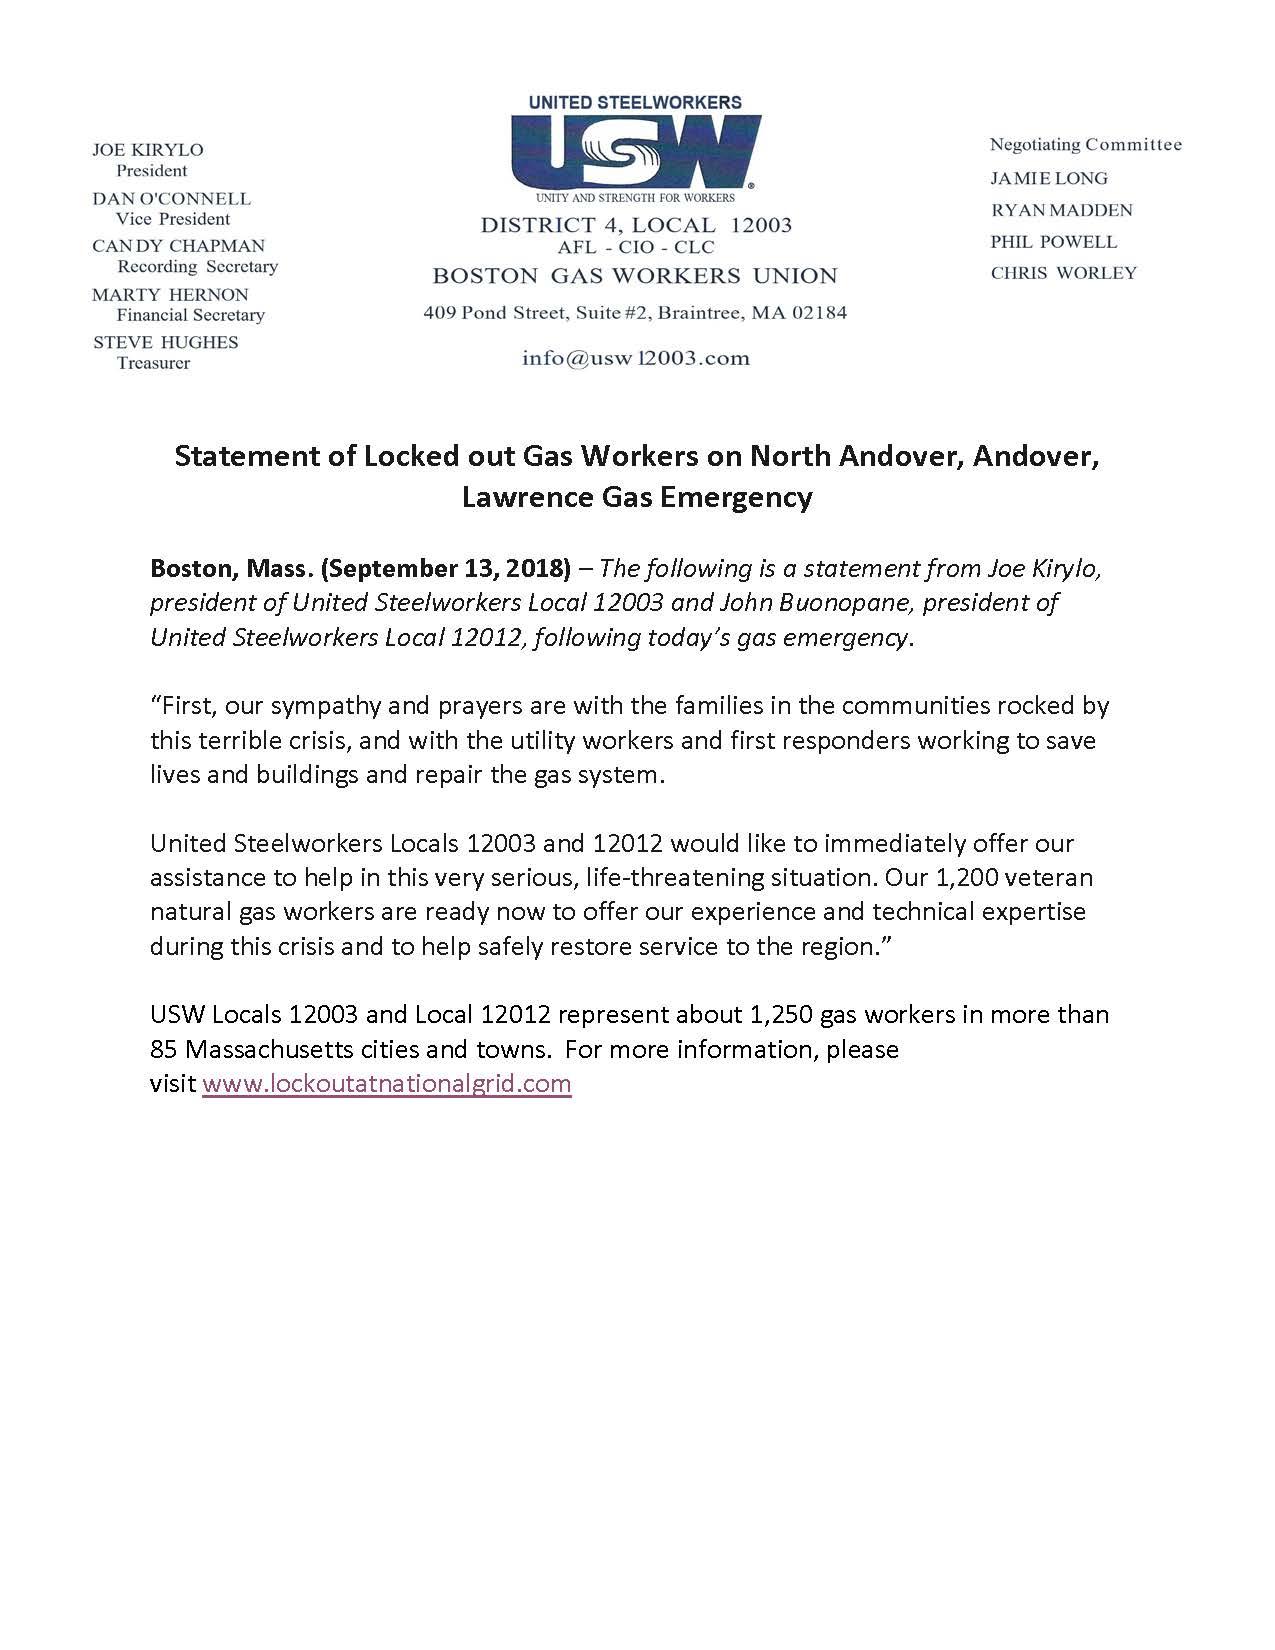 Columbia Acceptance Letter.Columbia Letter Ibew Local 2222